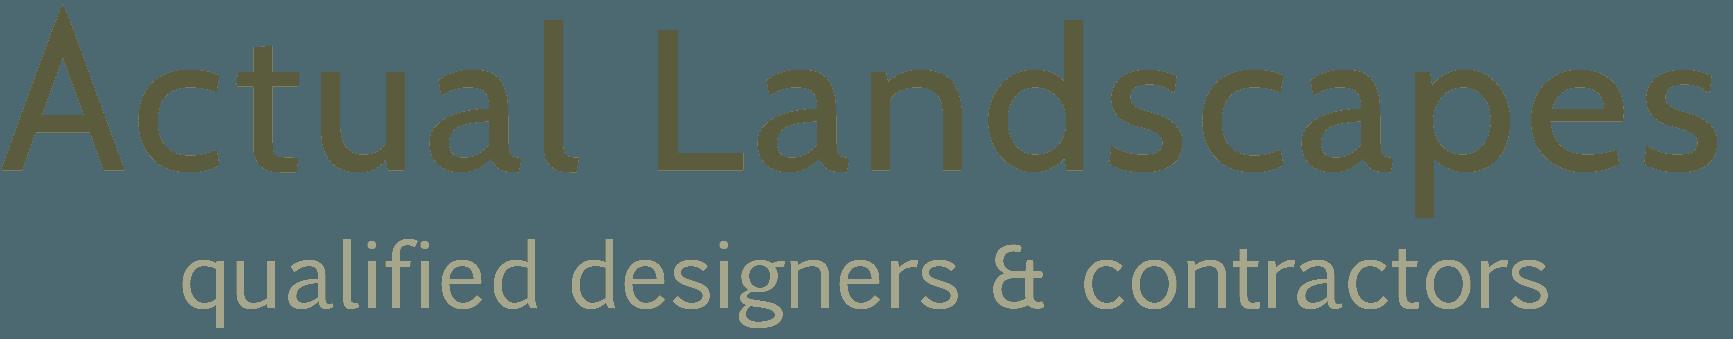 Actual landscapers logo